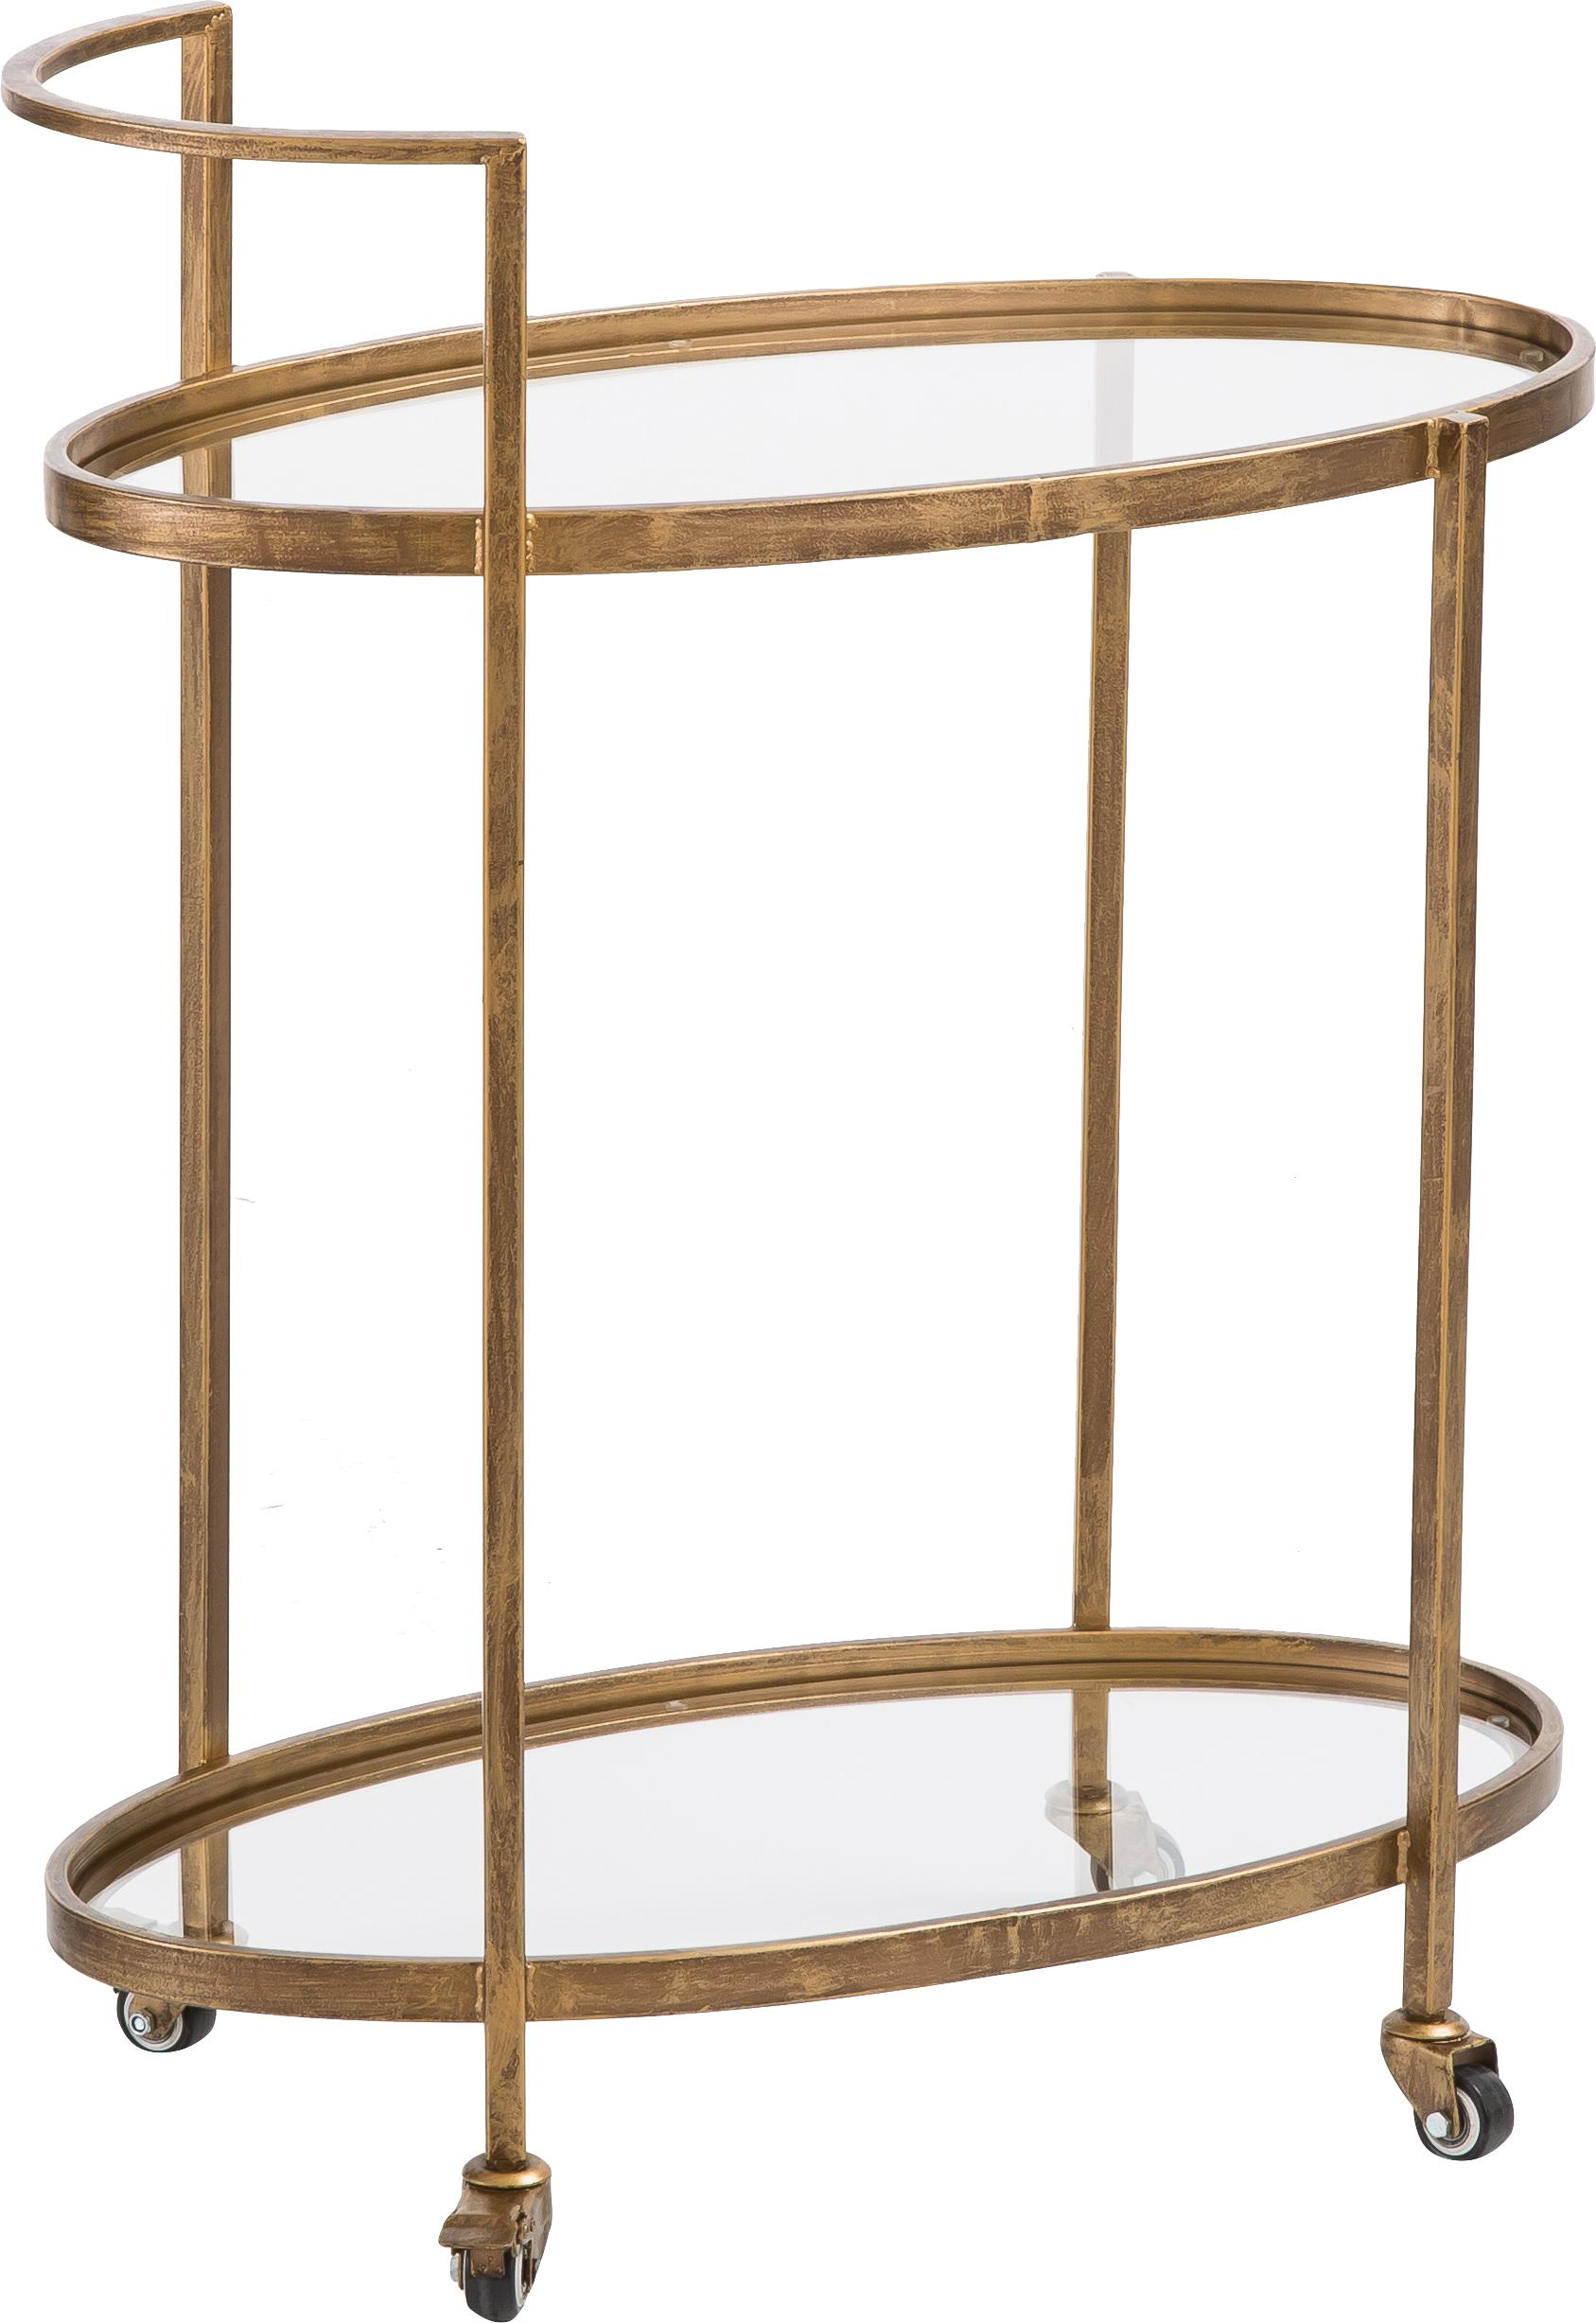 Camarera Push Antic, Estructura: metal, latón, Estantes: vidrio, Latón, transparente, An 67 x Al 86 cm